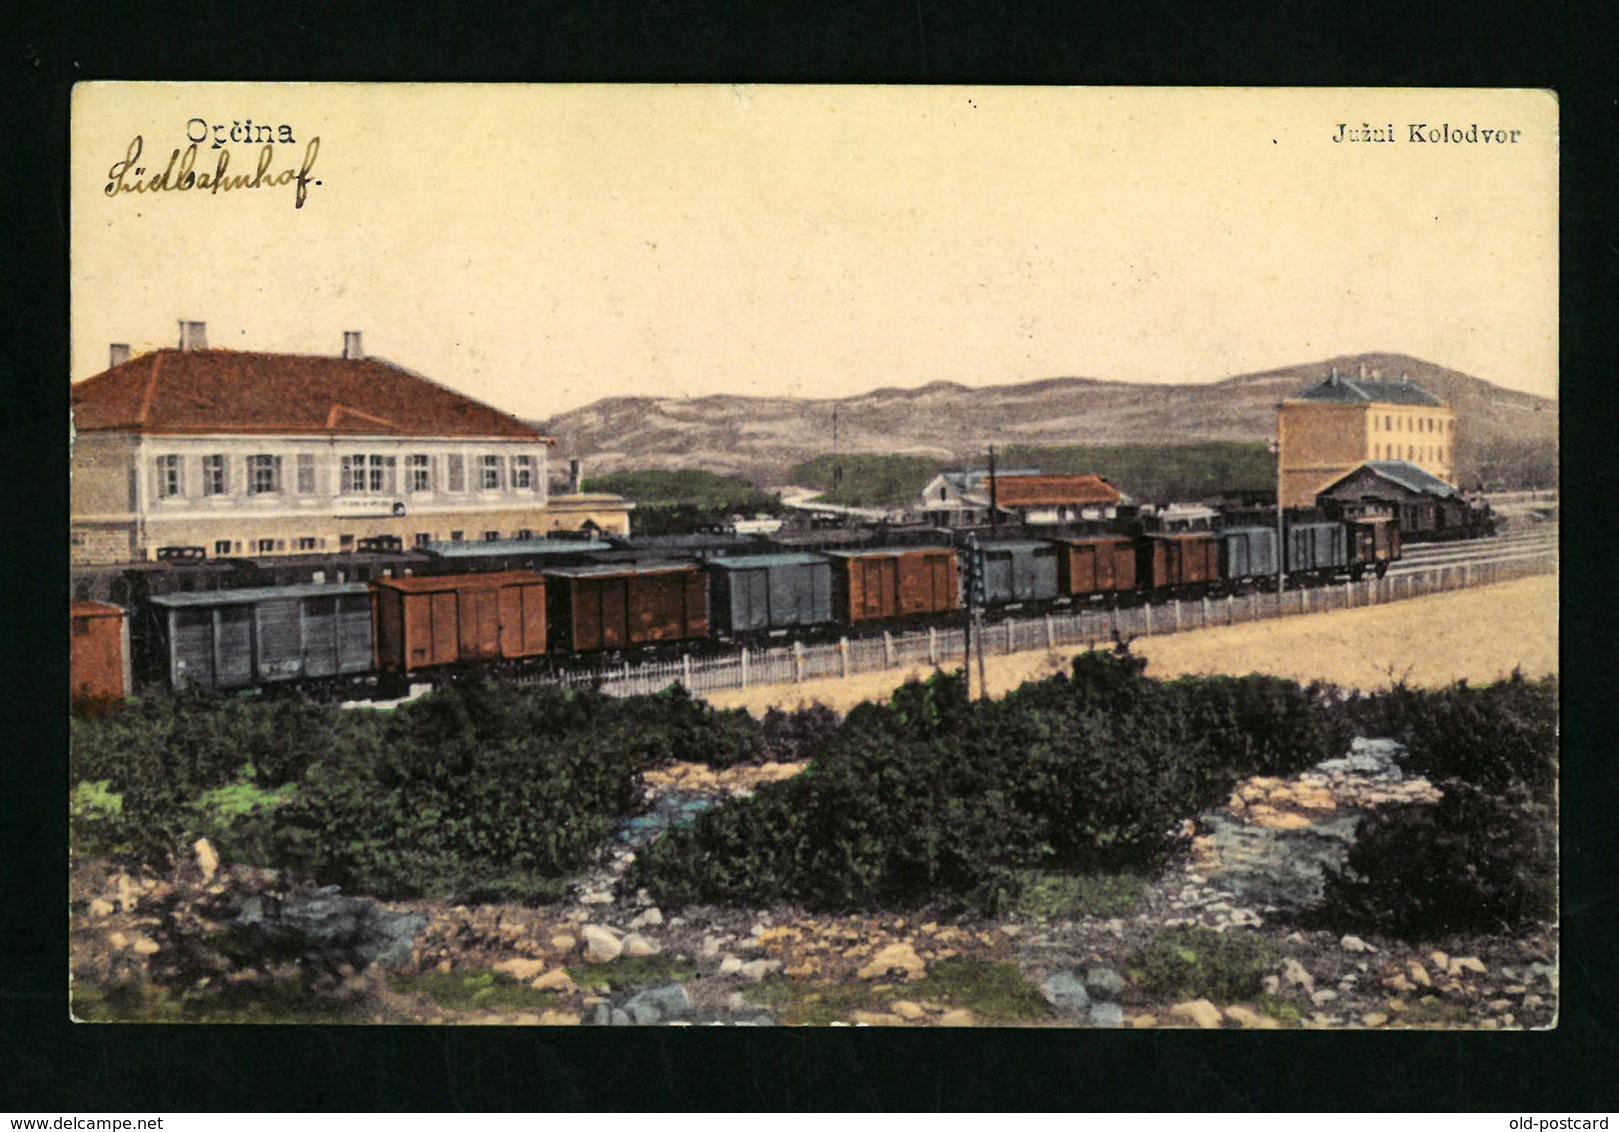 Opcina - Croatia / Bahnhof - Railway Station 1915  VF USED  POSTCARD - Croazia